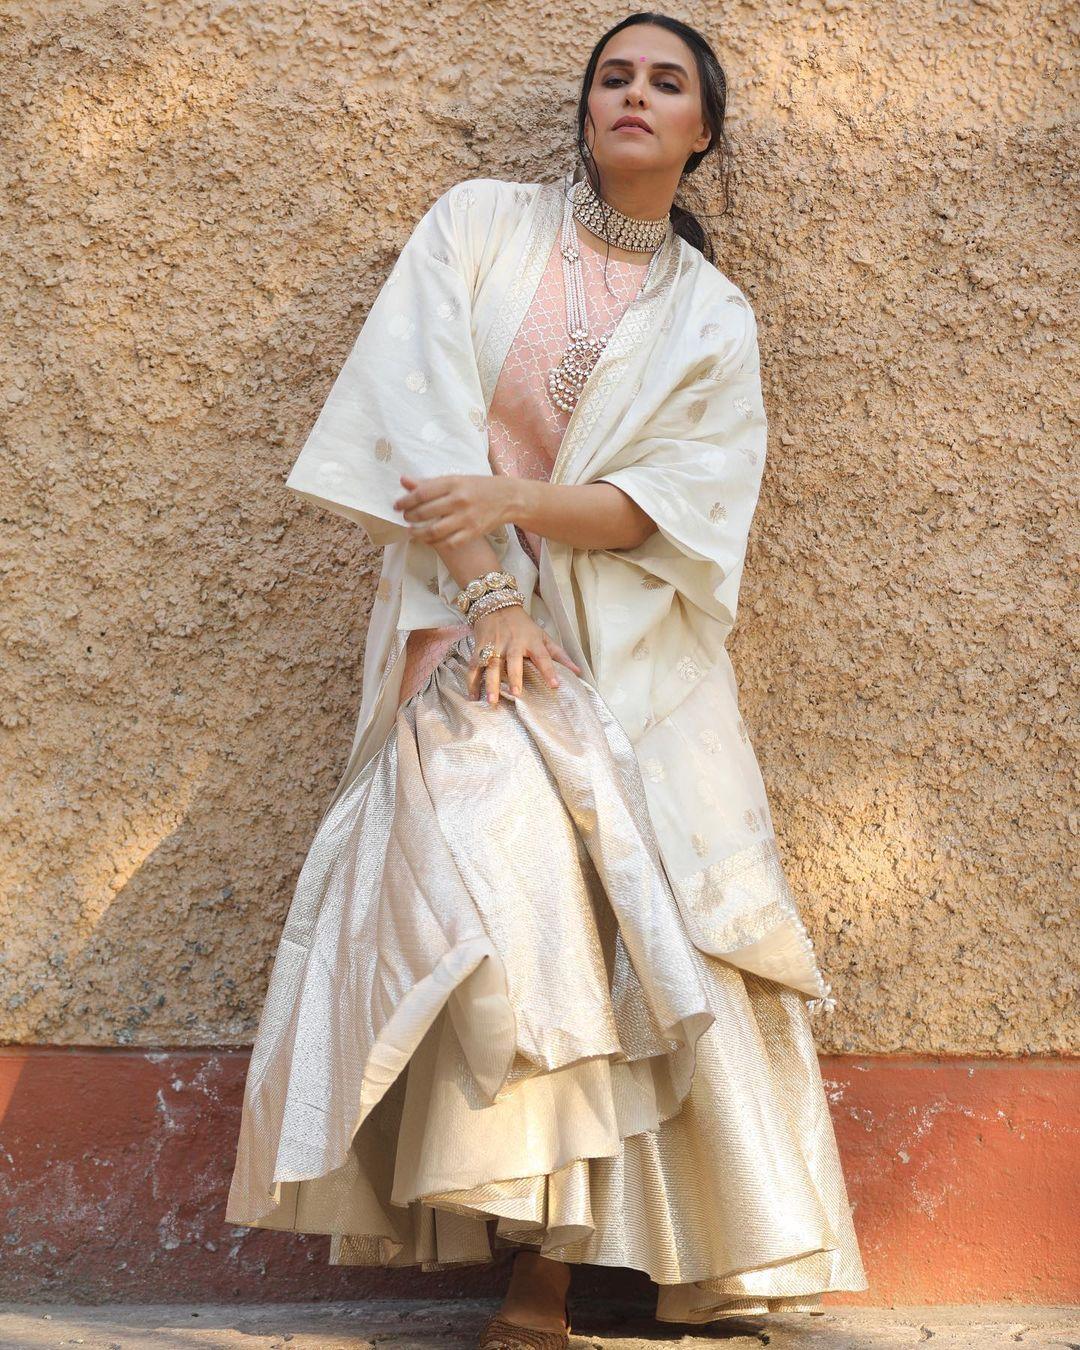 Actress Neha Dhupia Instagram Images (29)